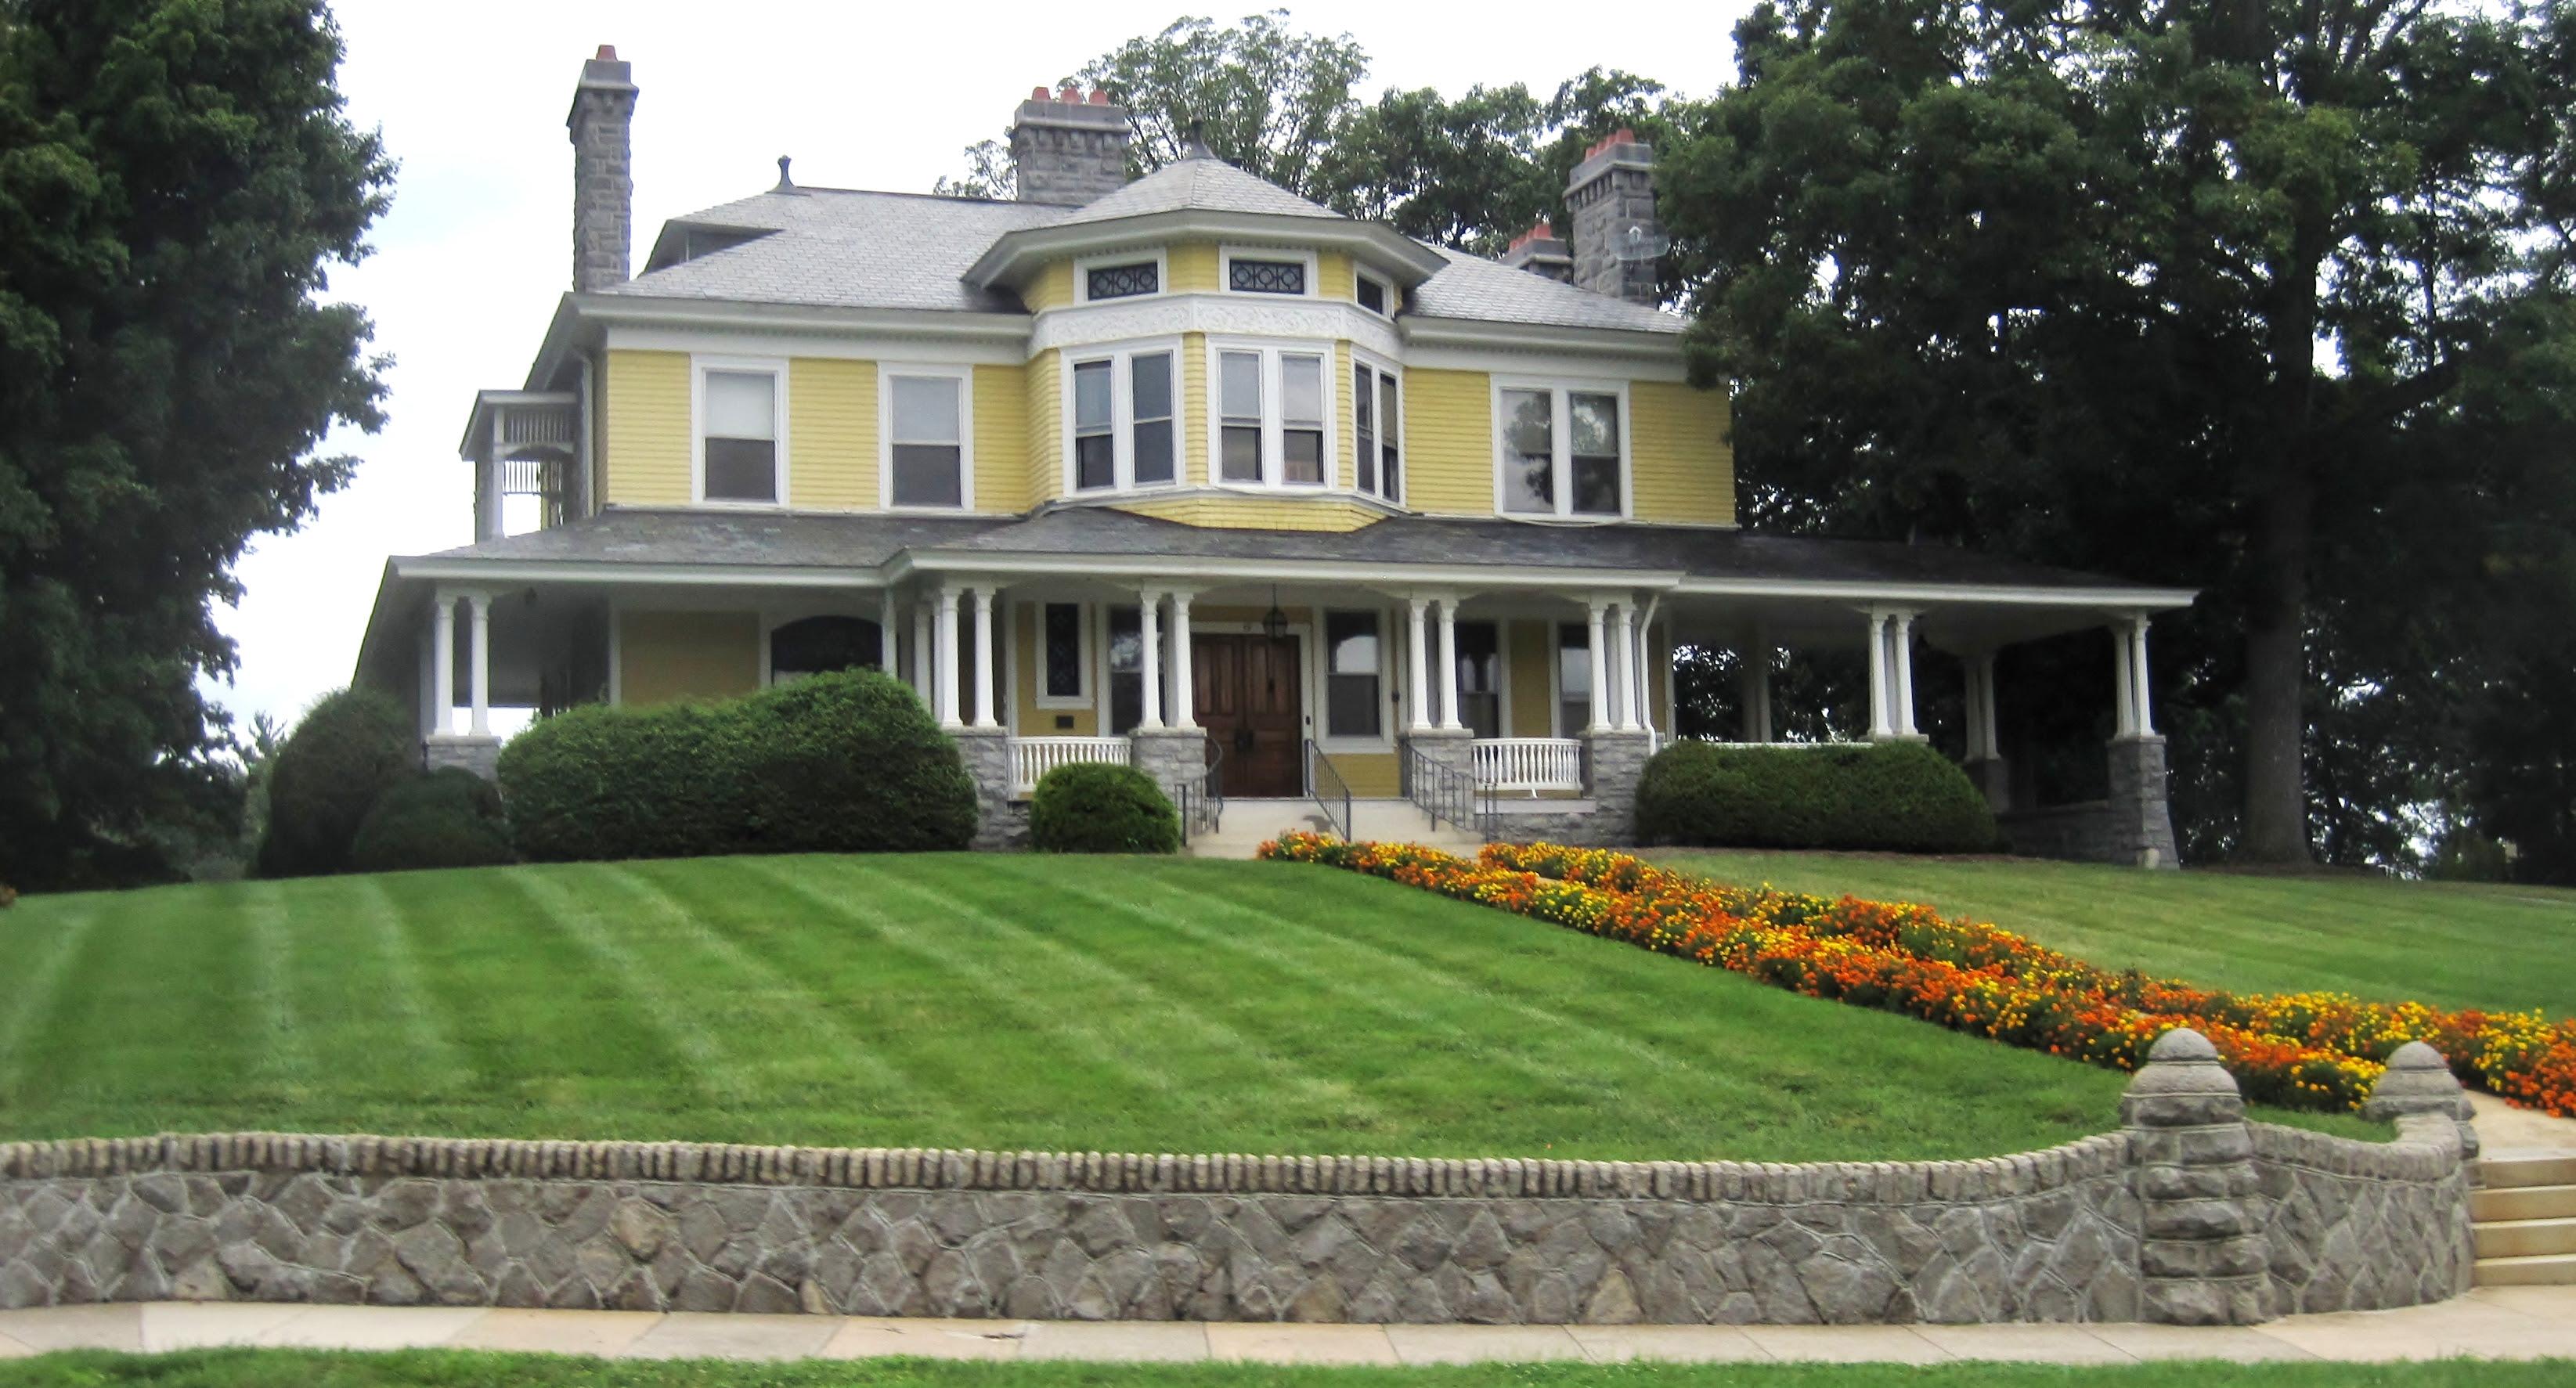 The Most Beautiful Historic Neighborhoods in America ...